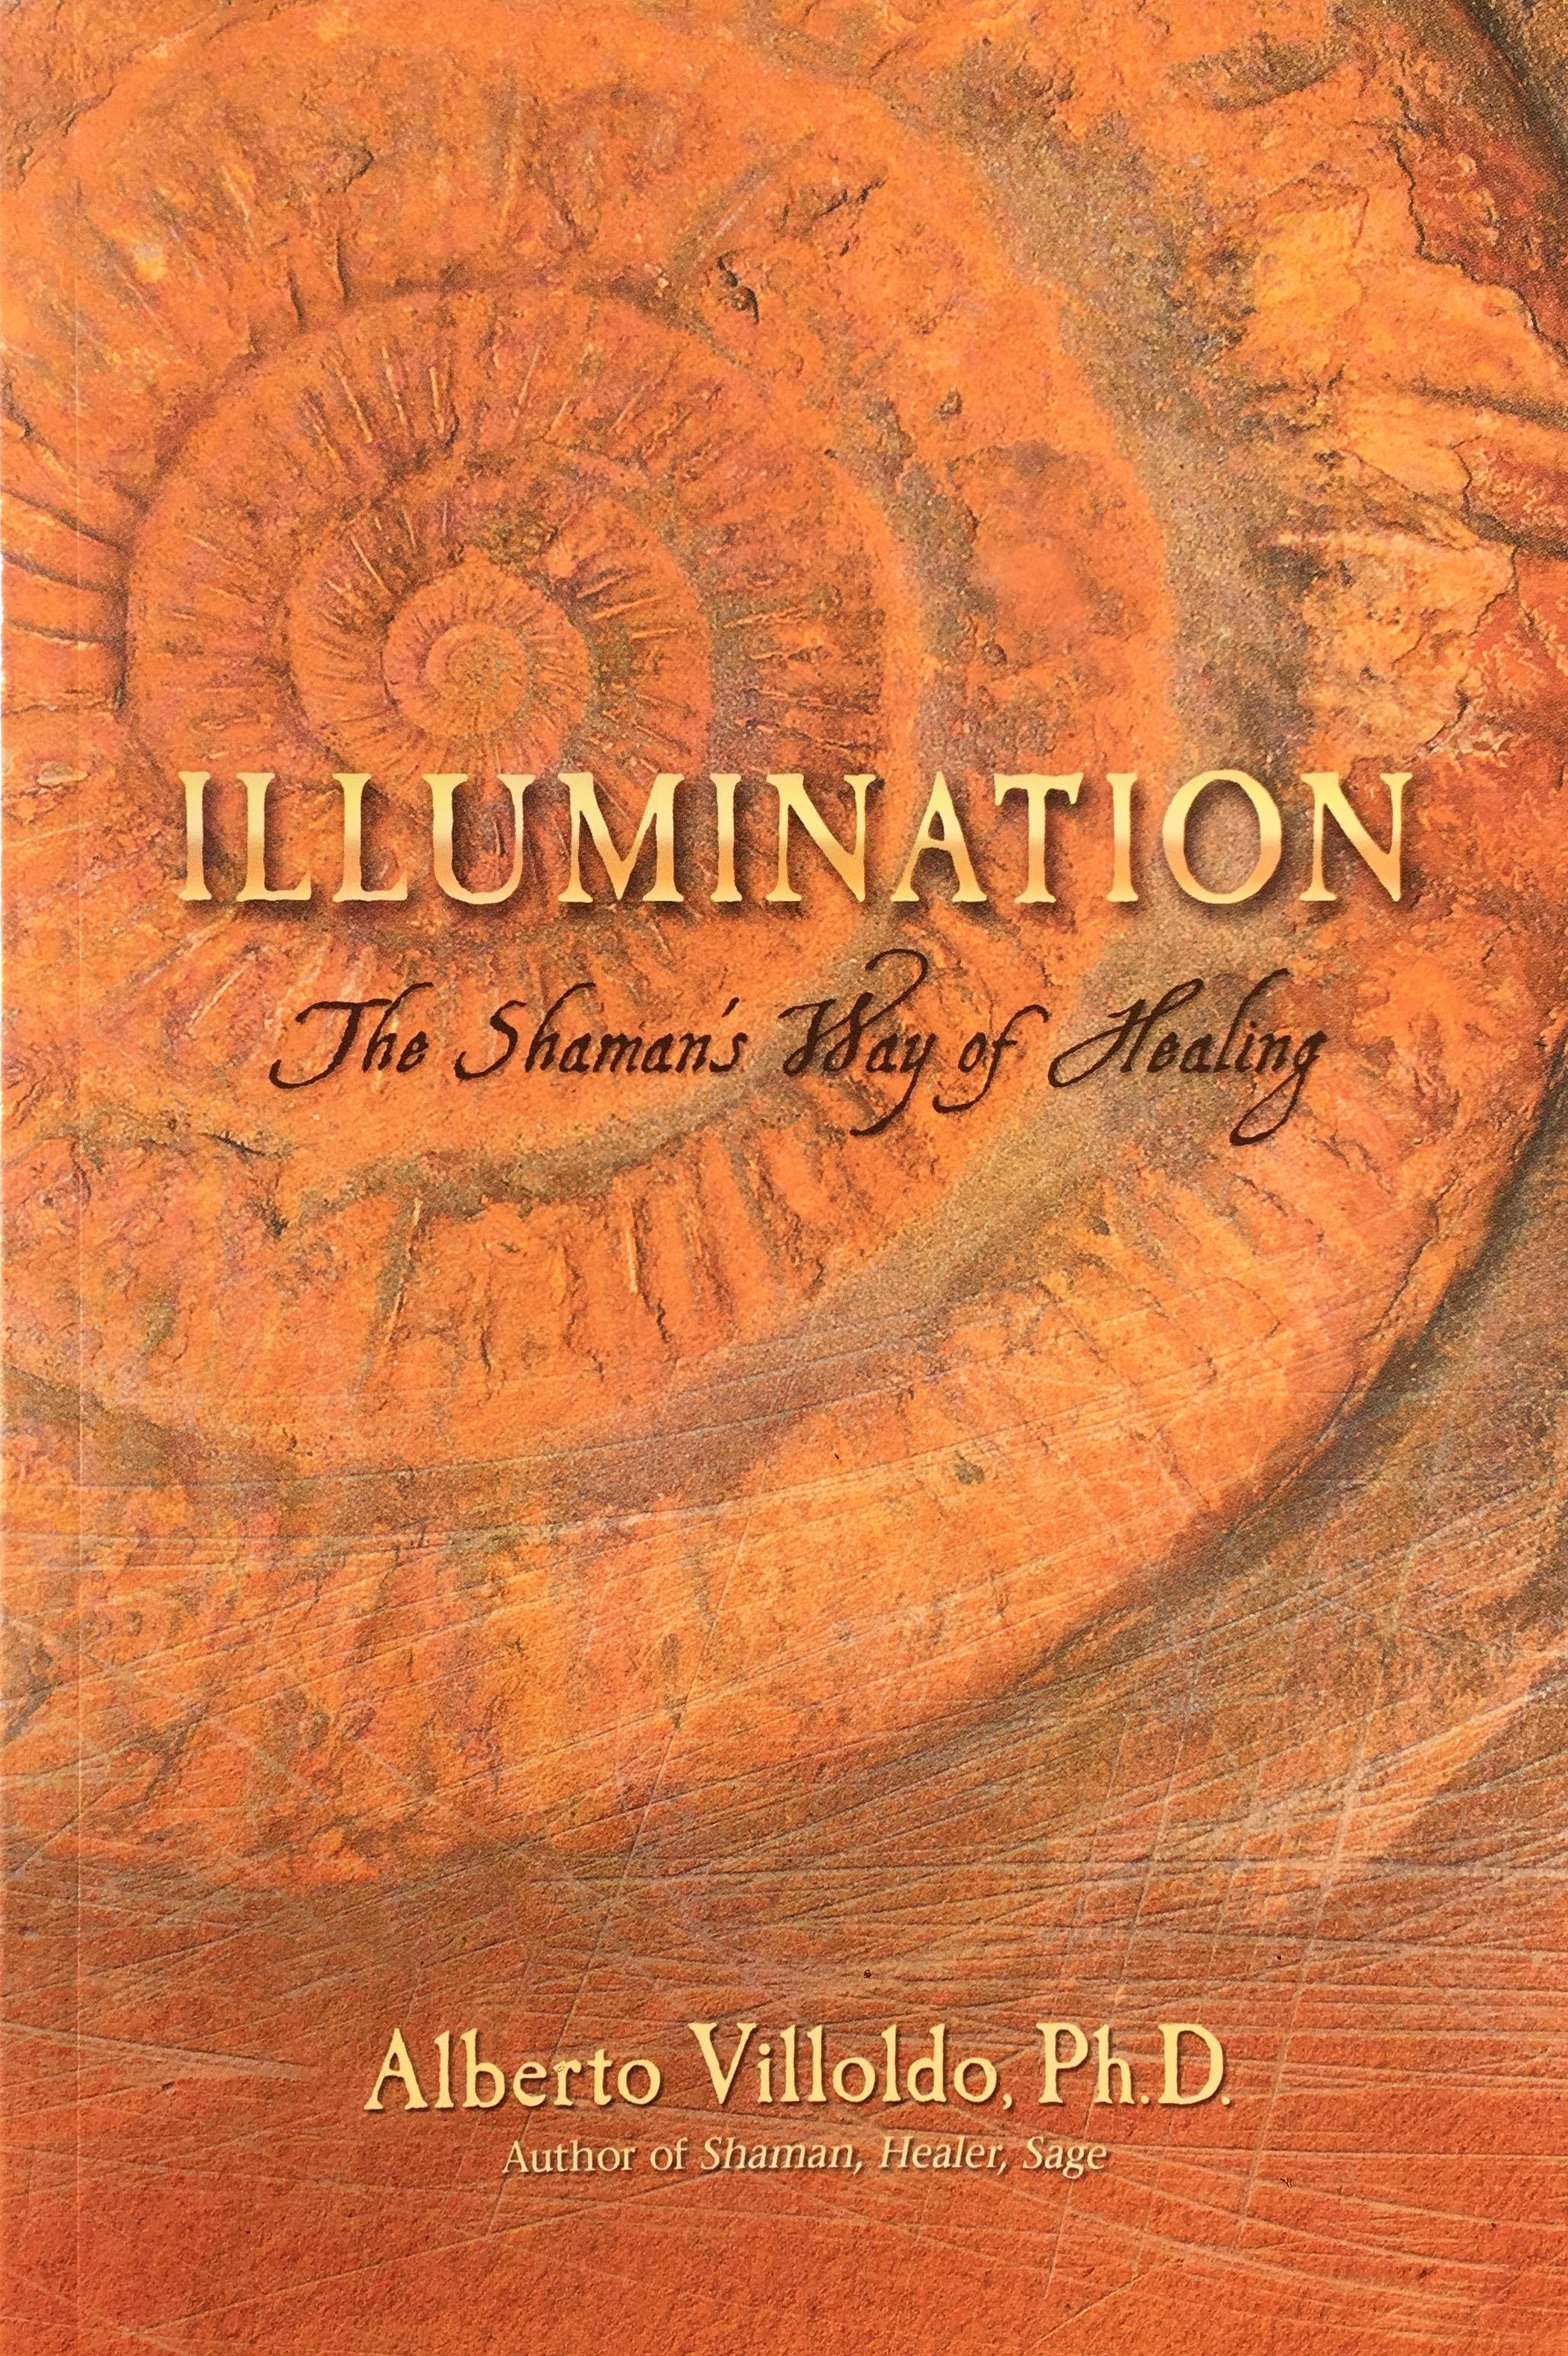 Illumination The Shaman Way of Healing BOOK.jpg